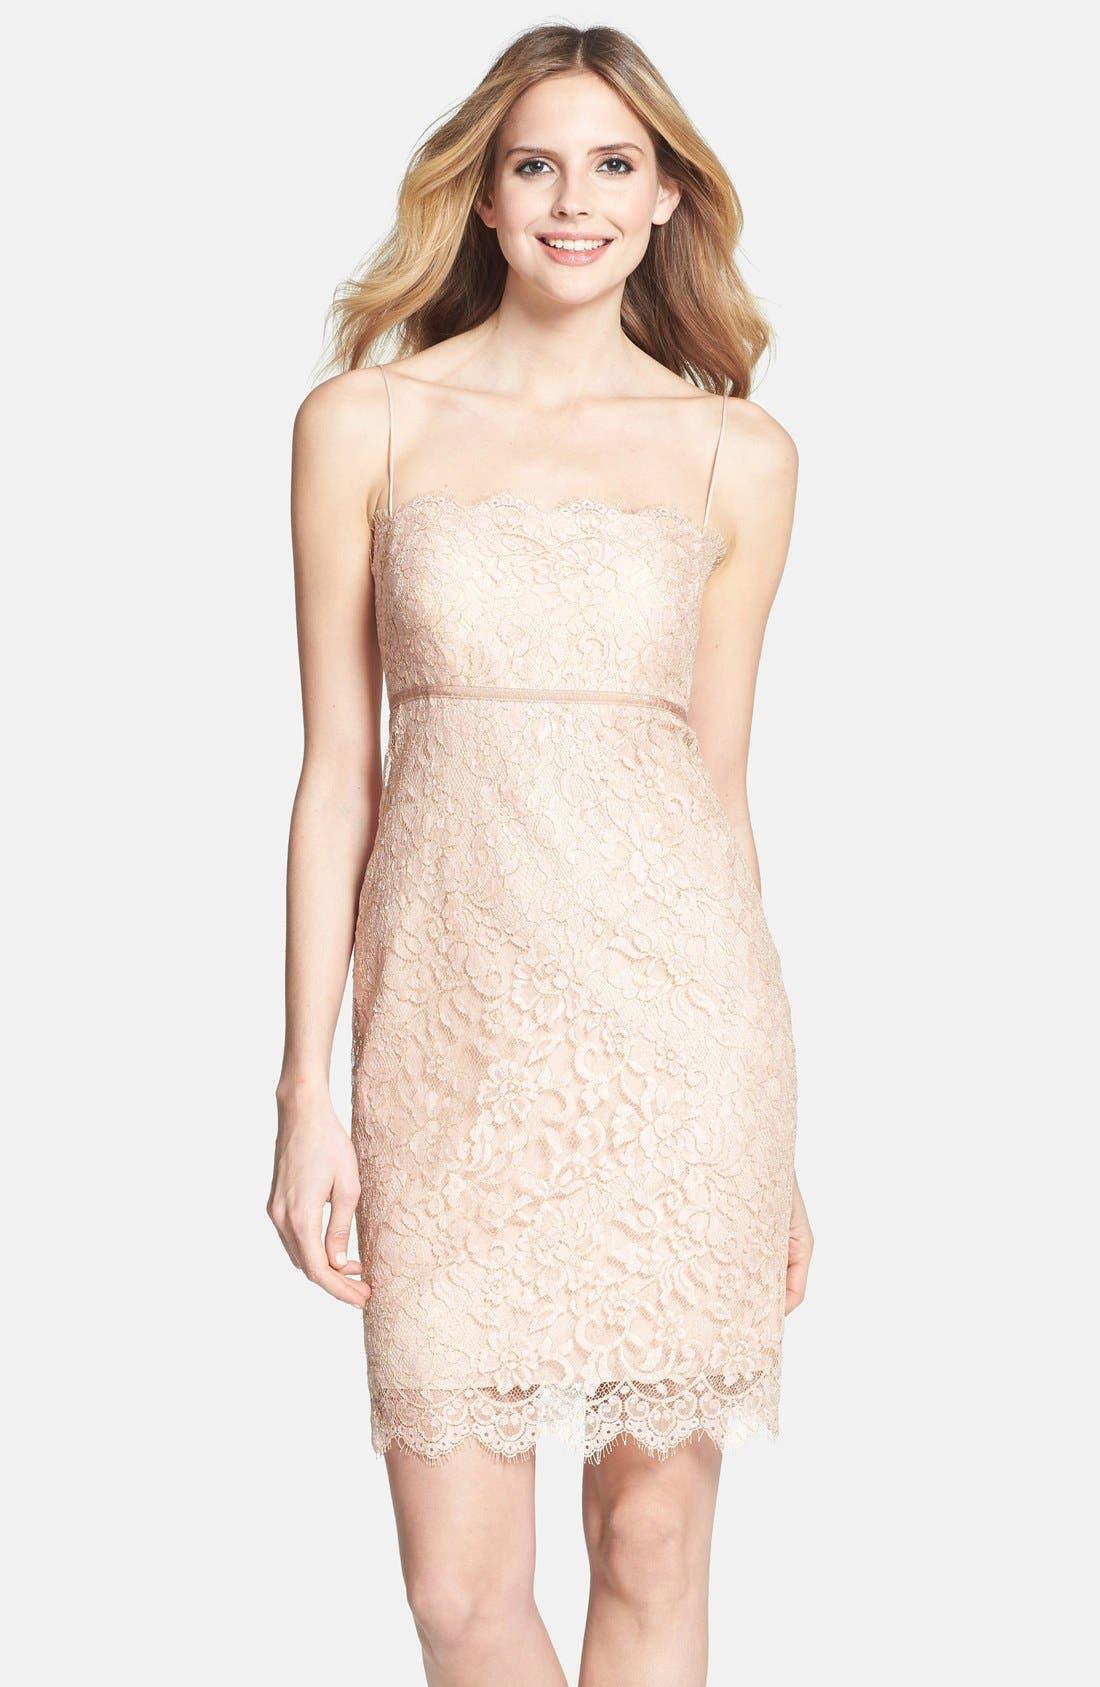 Alternate Image 1 Selected - Jenny Yoo 'Cosette' Lace Dress